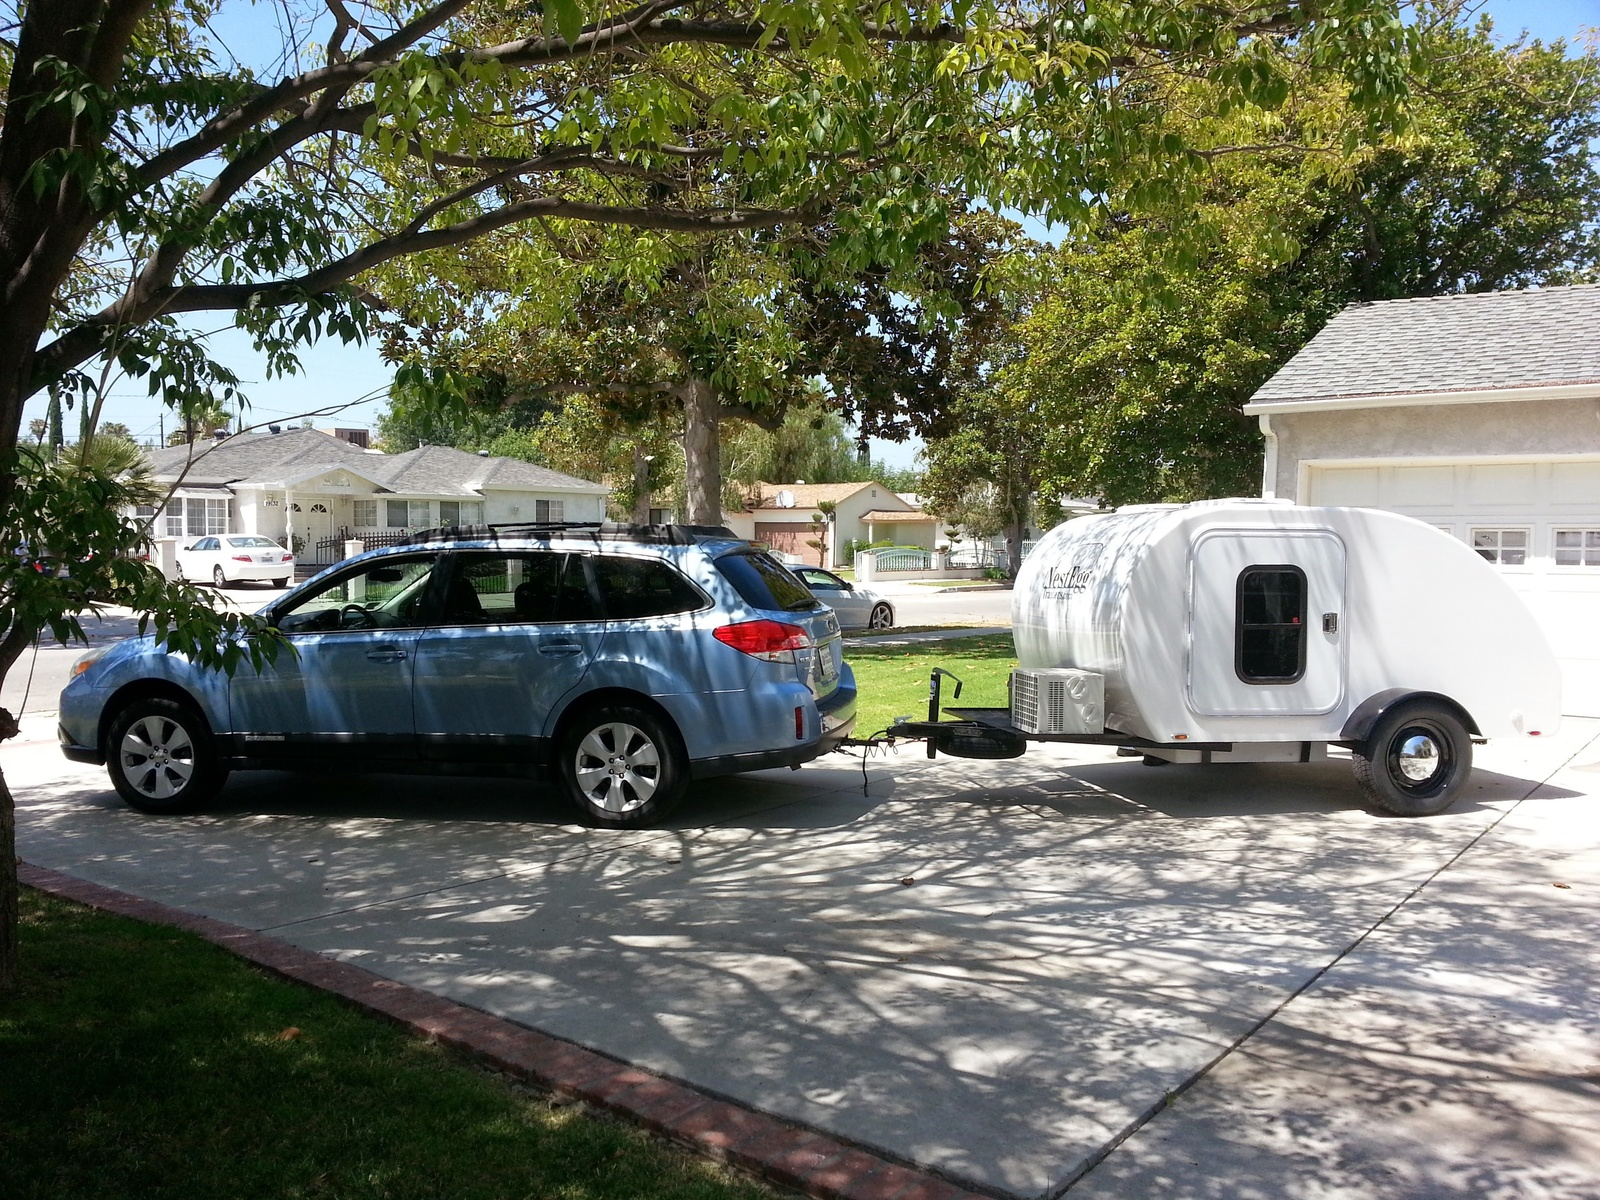 Subaru Outback Questions Towing on subarus CarGurus